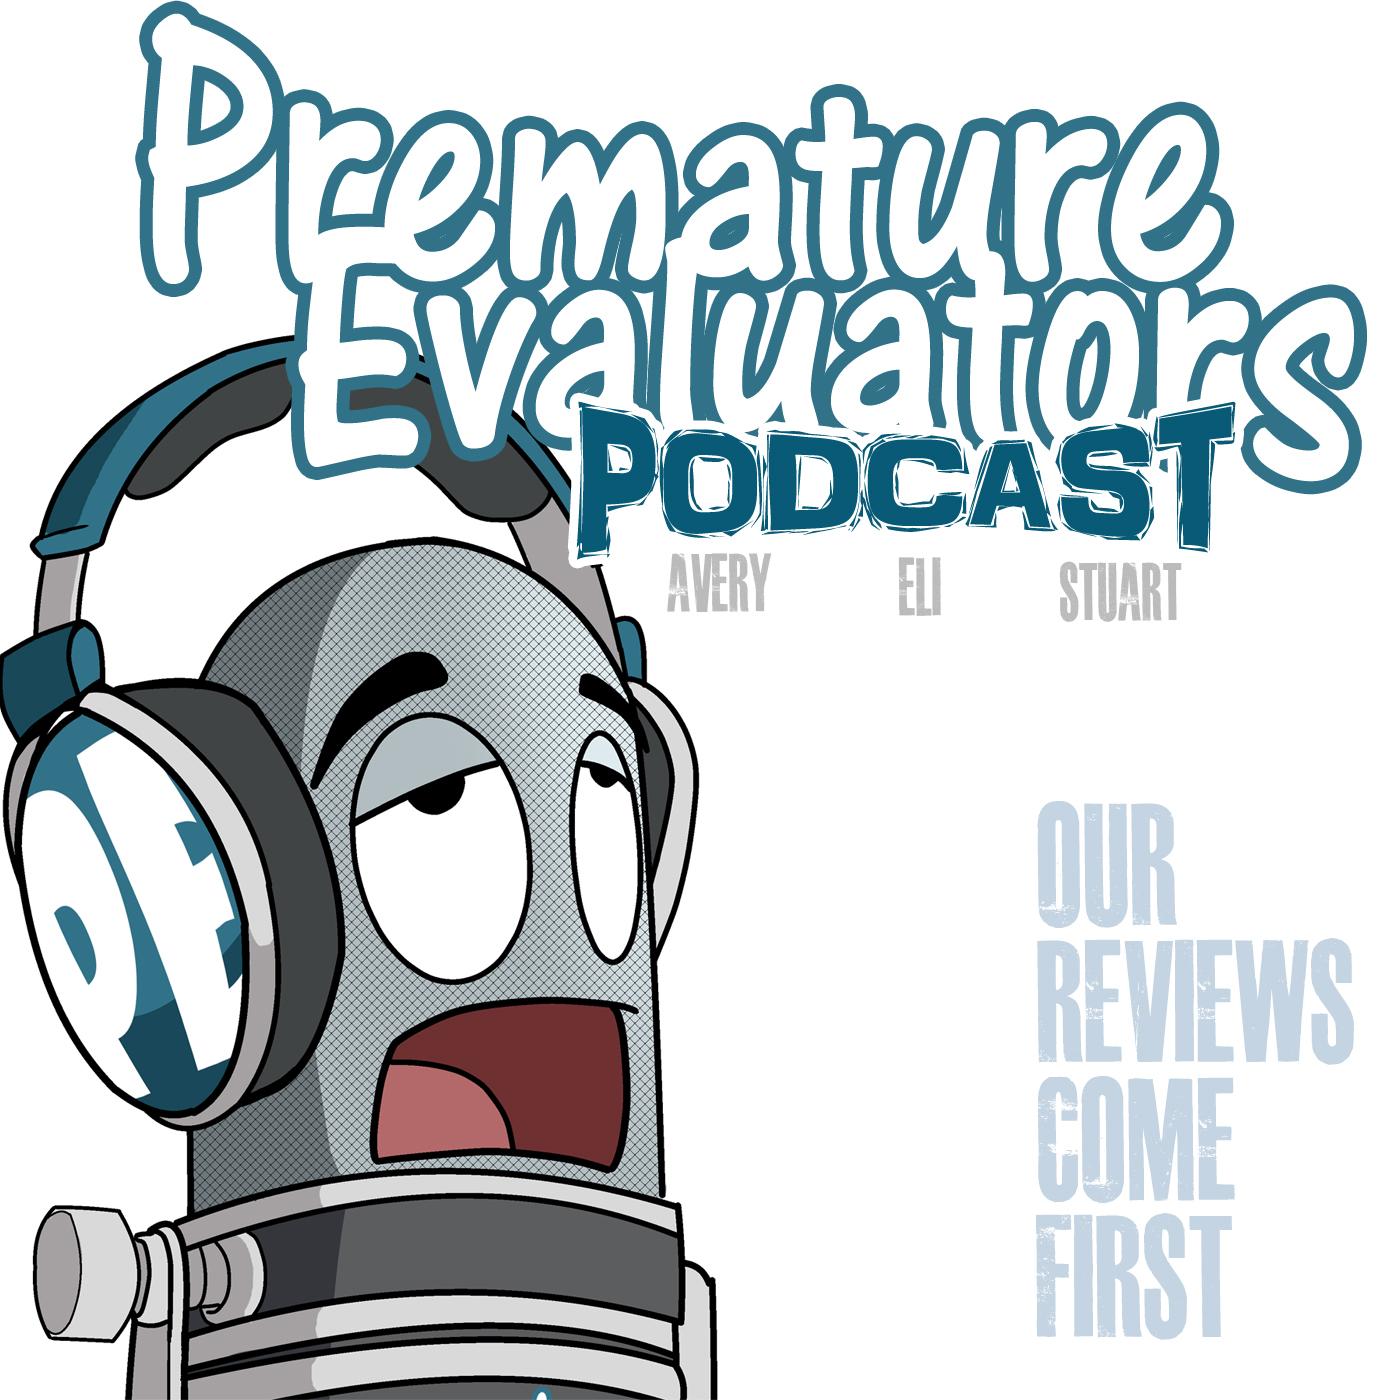 Premature Evaluators